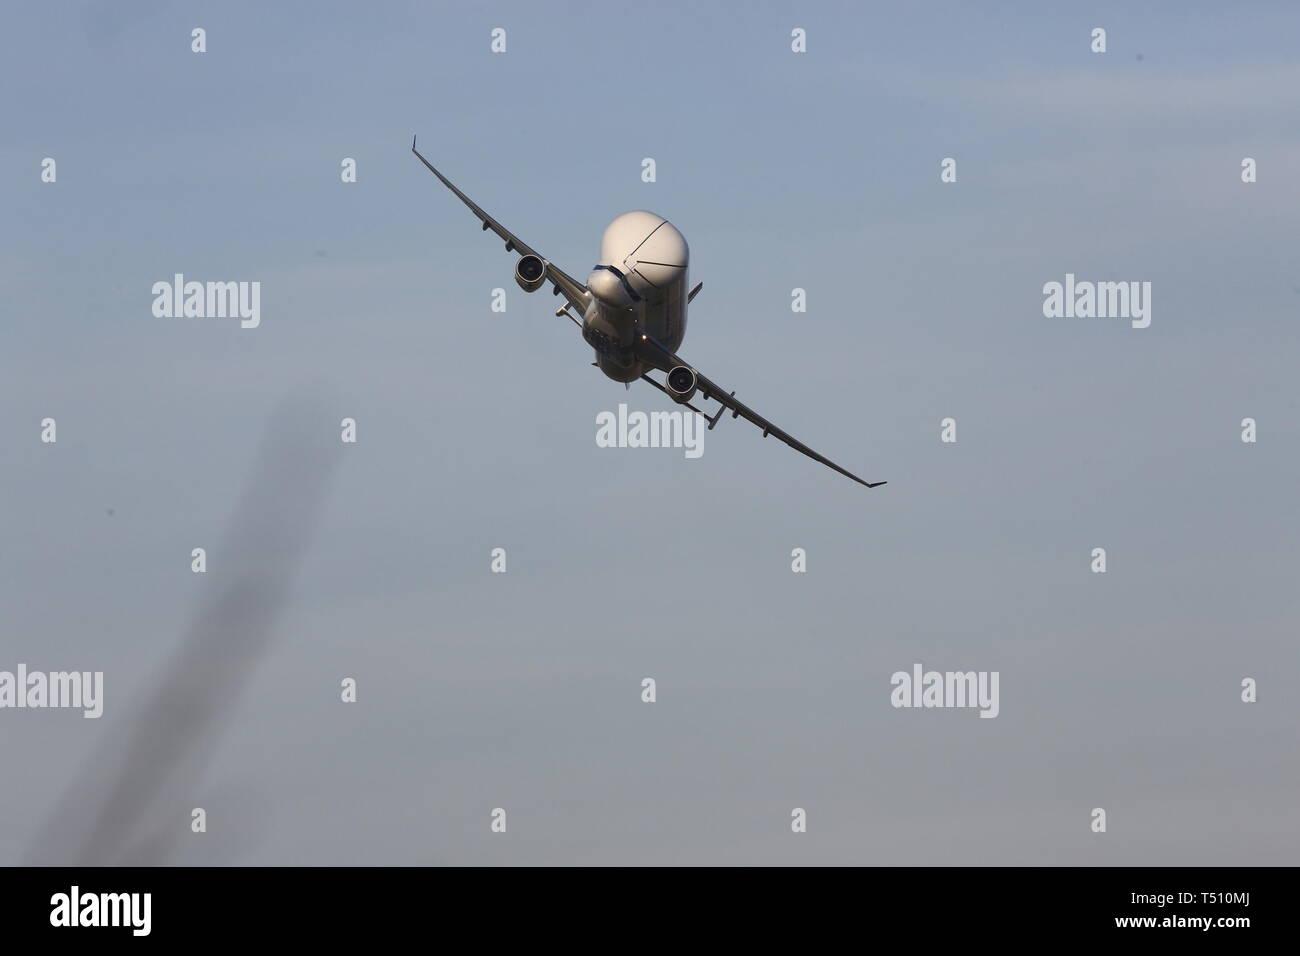 Beluga and Beluga XL taking off from Hawarden Airport credit Ian Fairbrother/Alamy Stock Photos Stock Photo